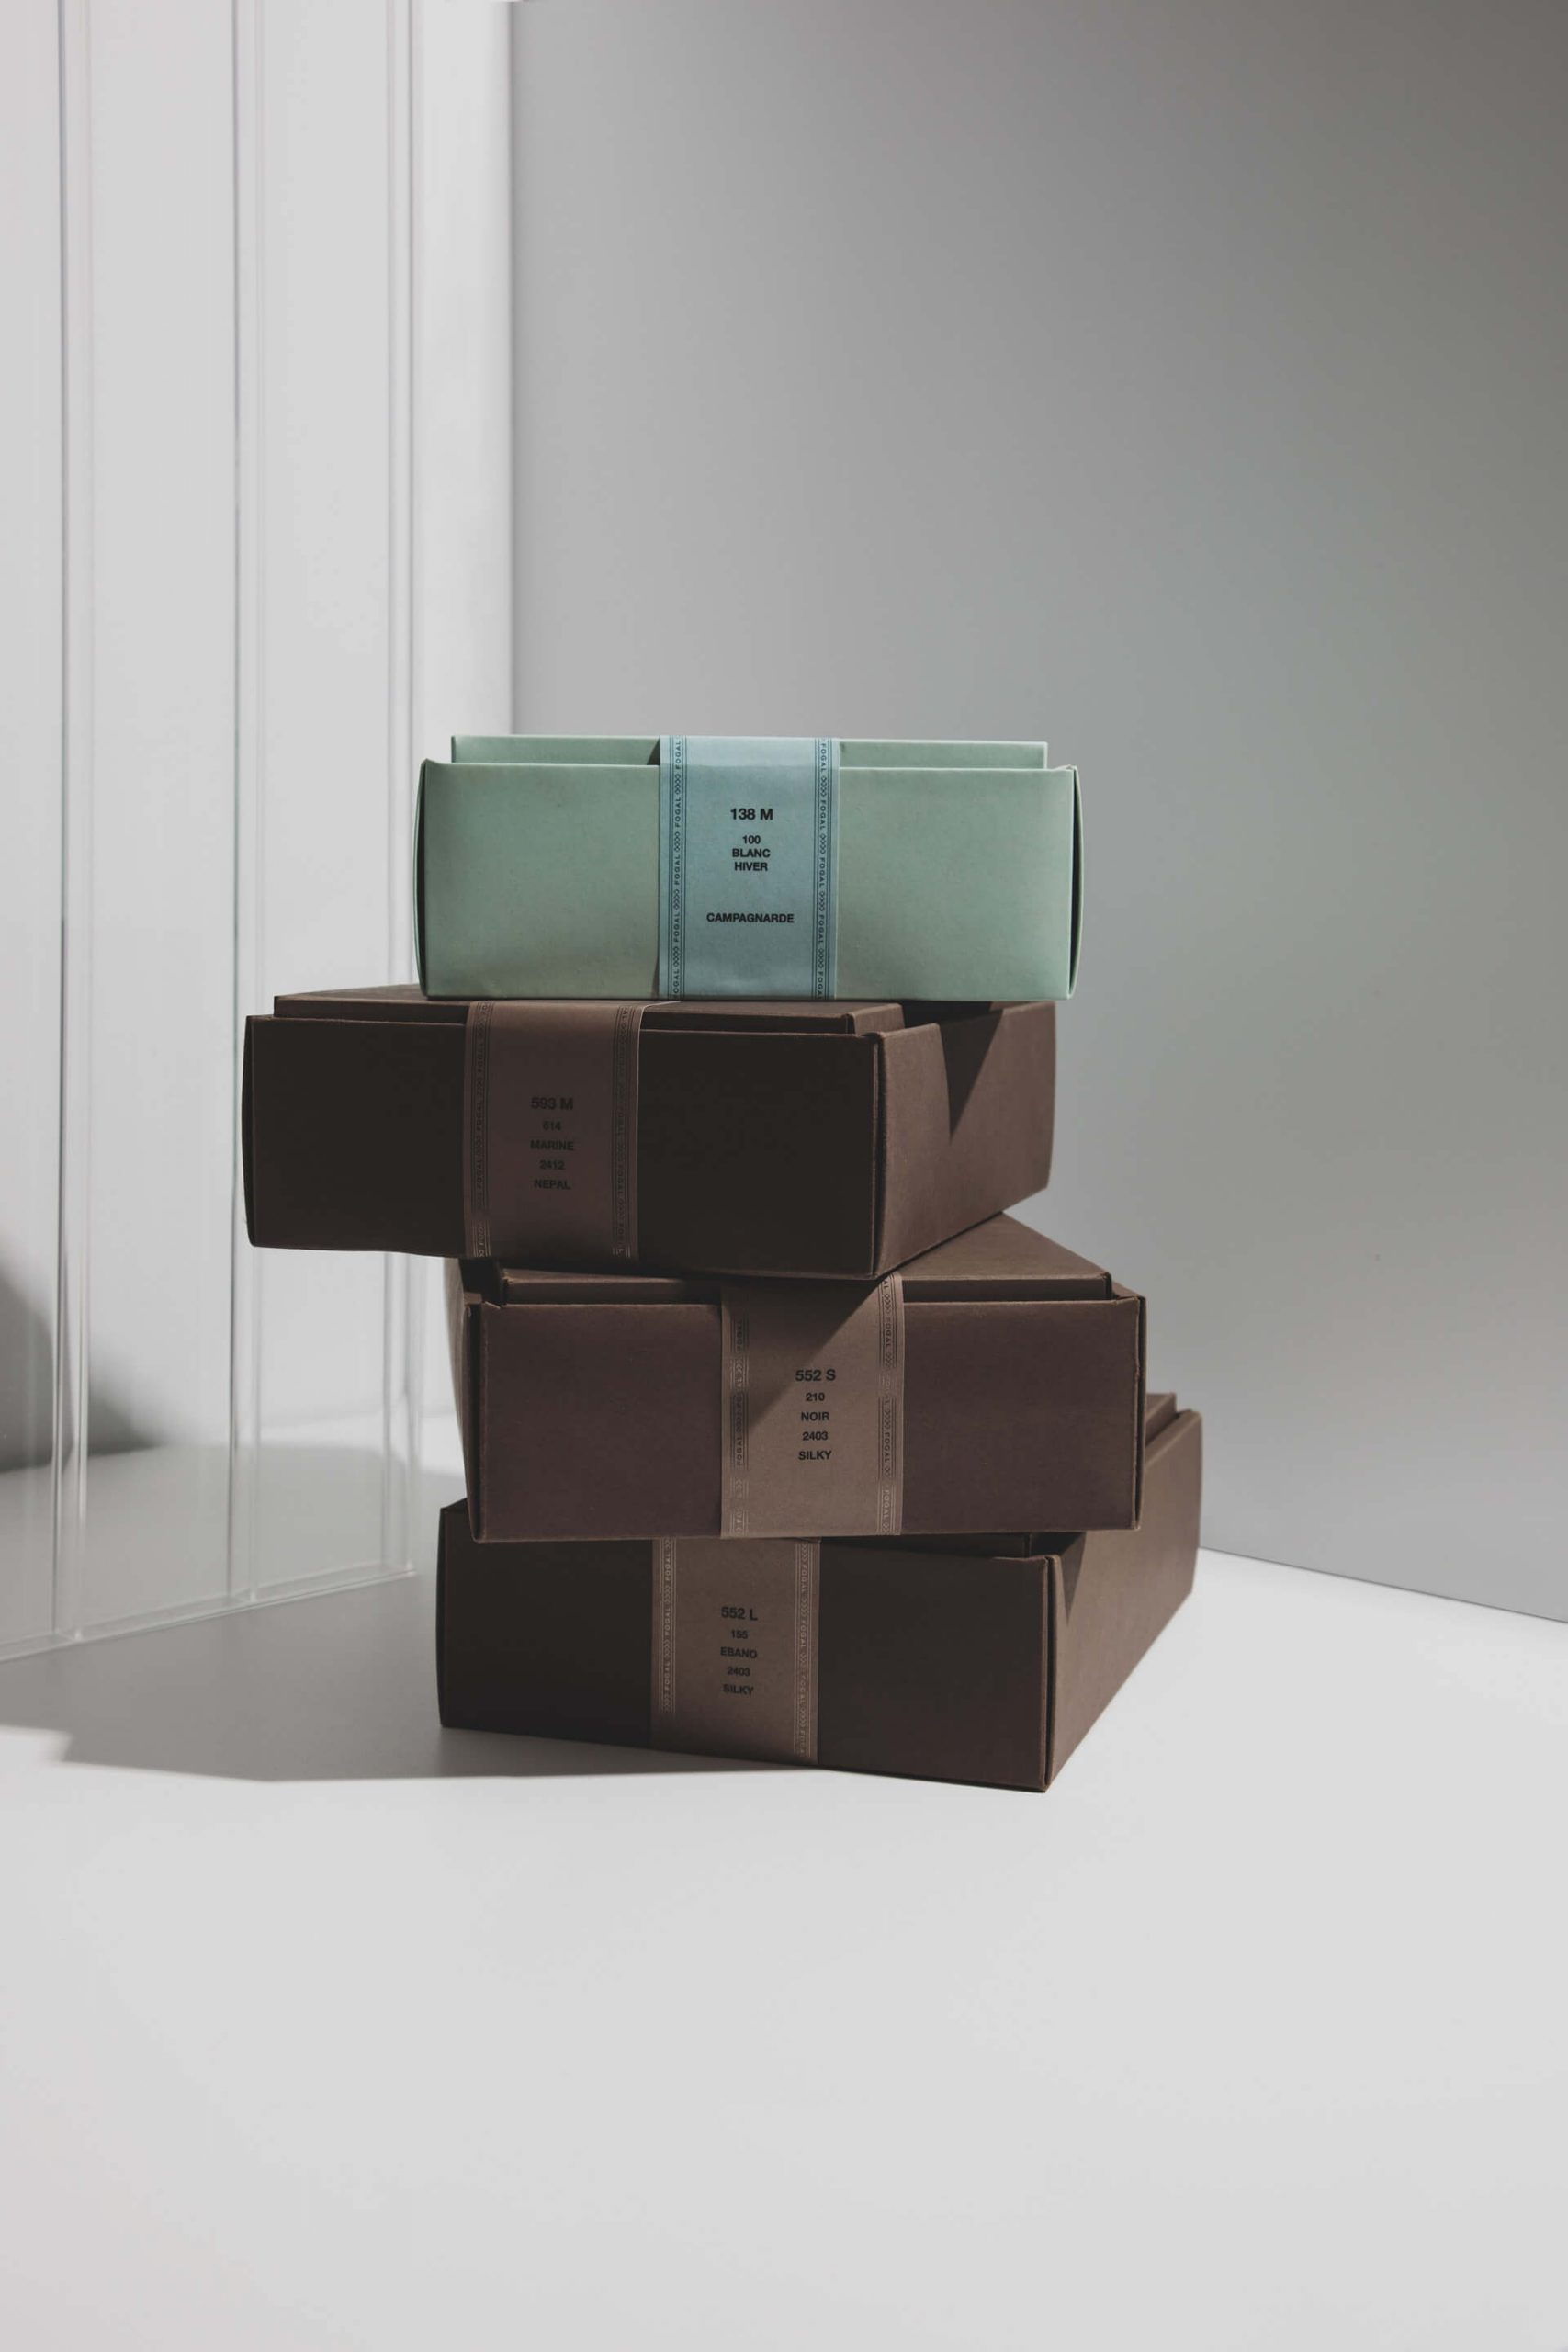 fogal-packaging-5